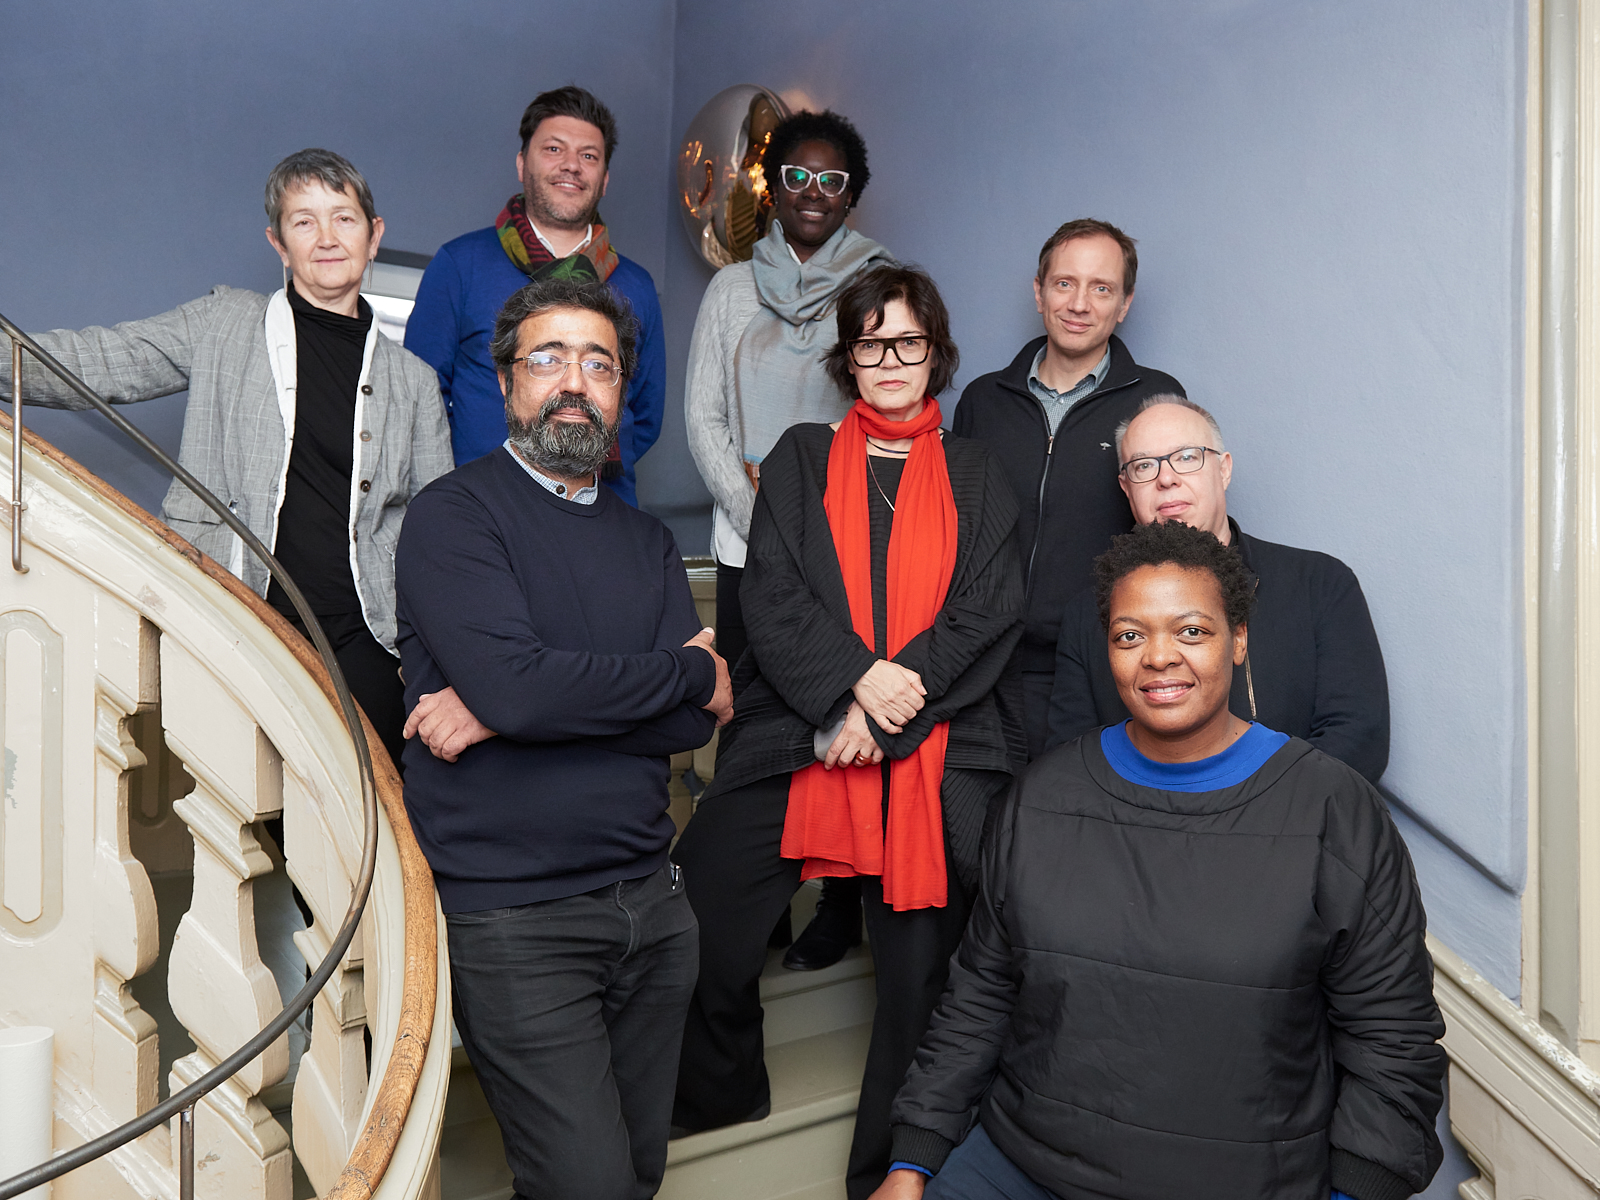 Der internationale documenta Beirat: Frances Morris, Amar Kanwar, Philippe Pirotte, Elvira Dyangani Ose, Ute Meta Bauer, Jochen Volz, Charles Esche, Gabi Ngcobo